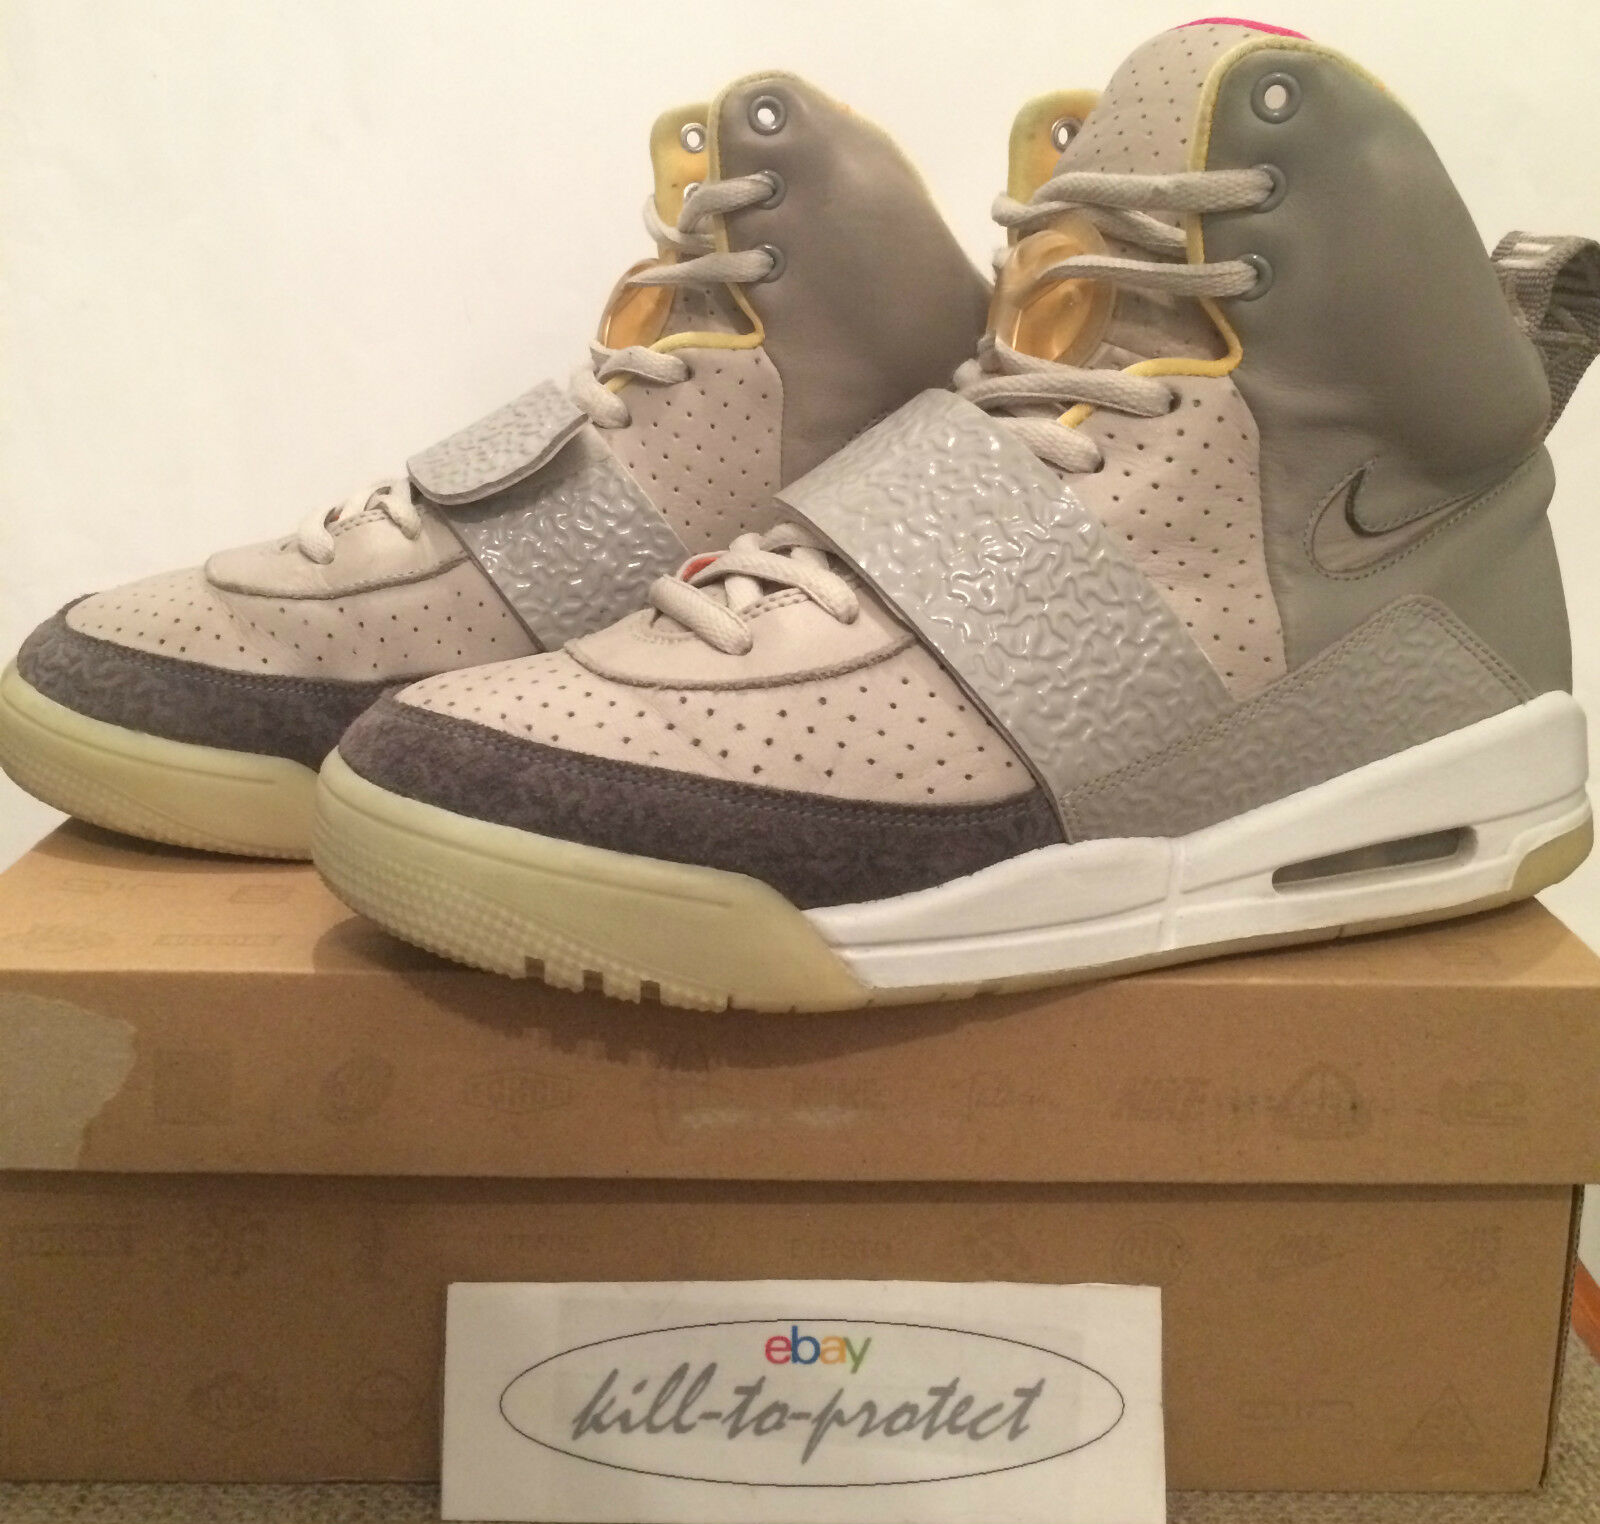 ec9d941b Спортивная обувь для мужчины (USED) NIKE AIR YEEZY 1 One ZEN GREY US8 UK7  Tan 366164-002 By Kanye West 2009 - 141676713909 - купить на eBay.com (США)  с ...